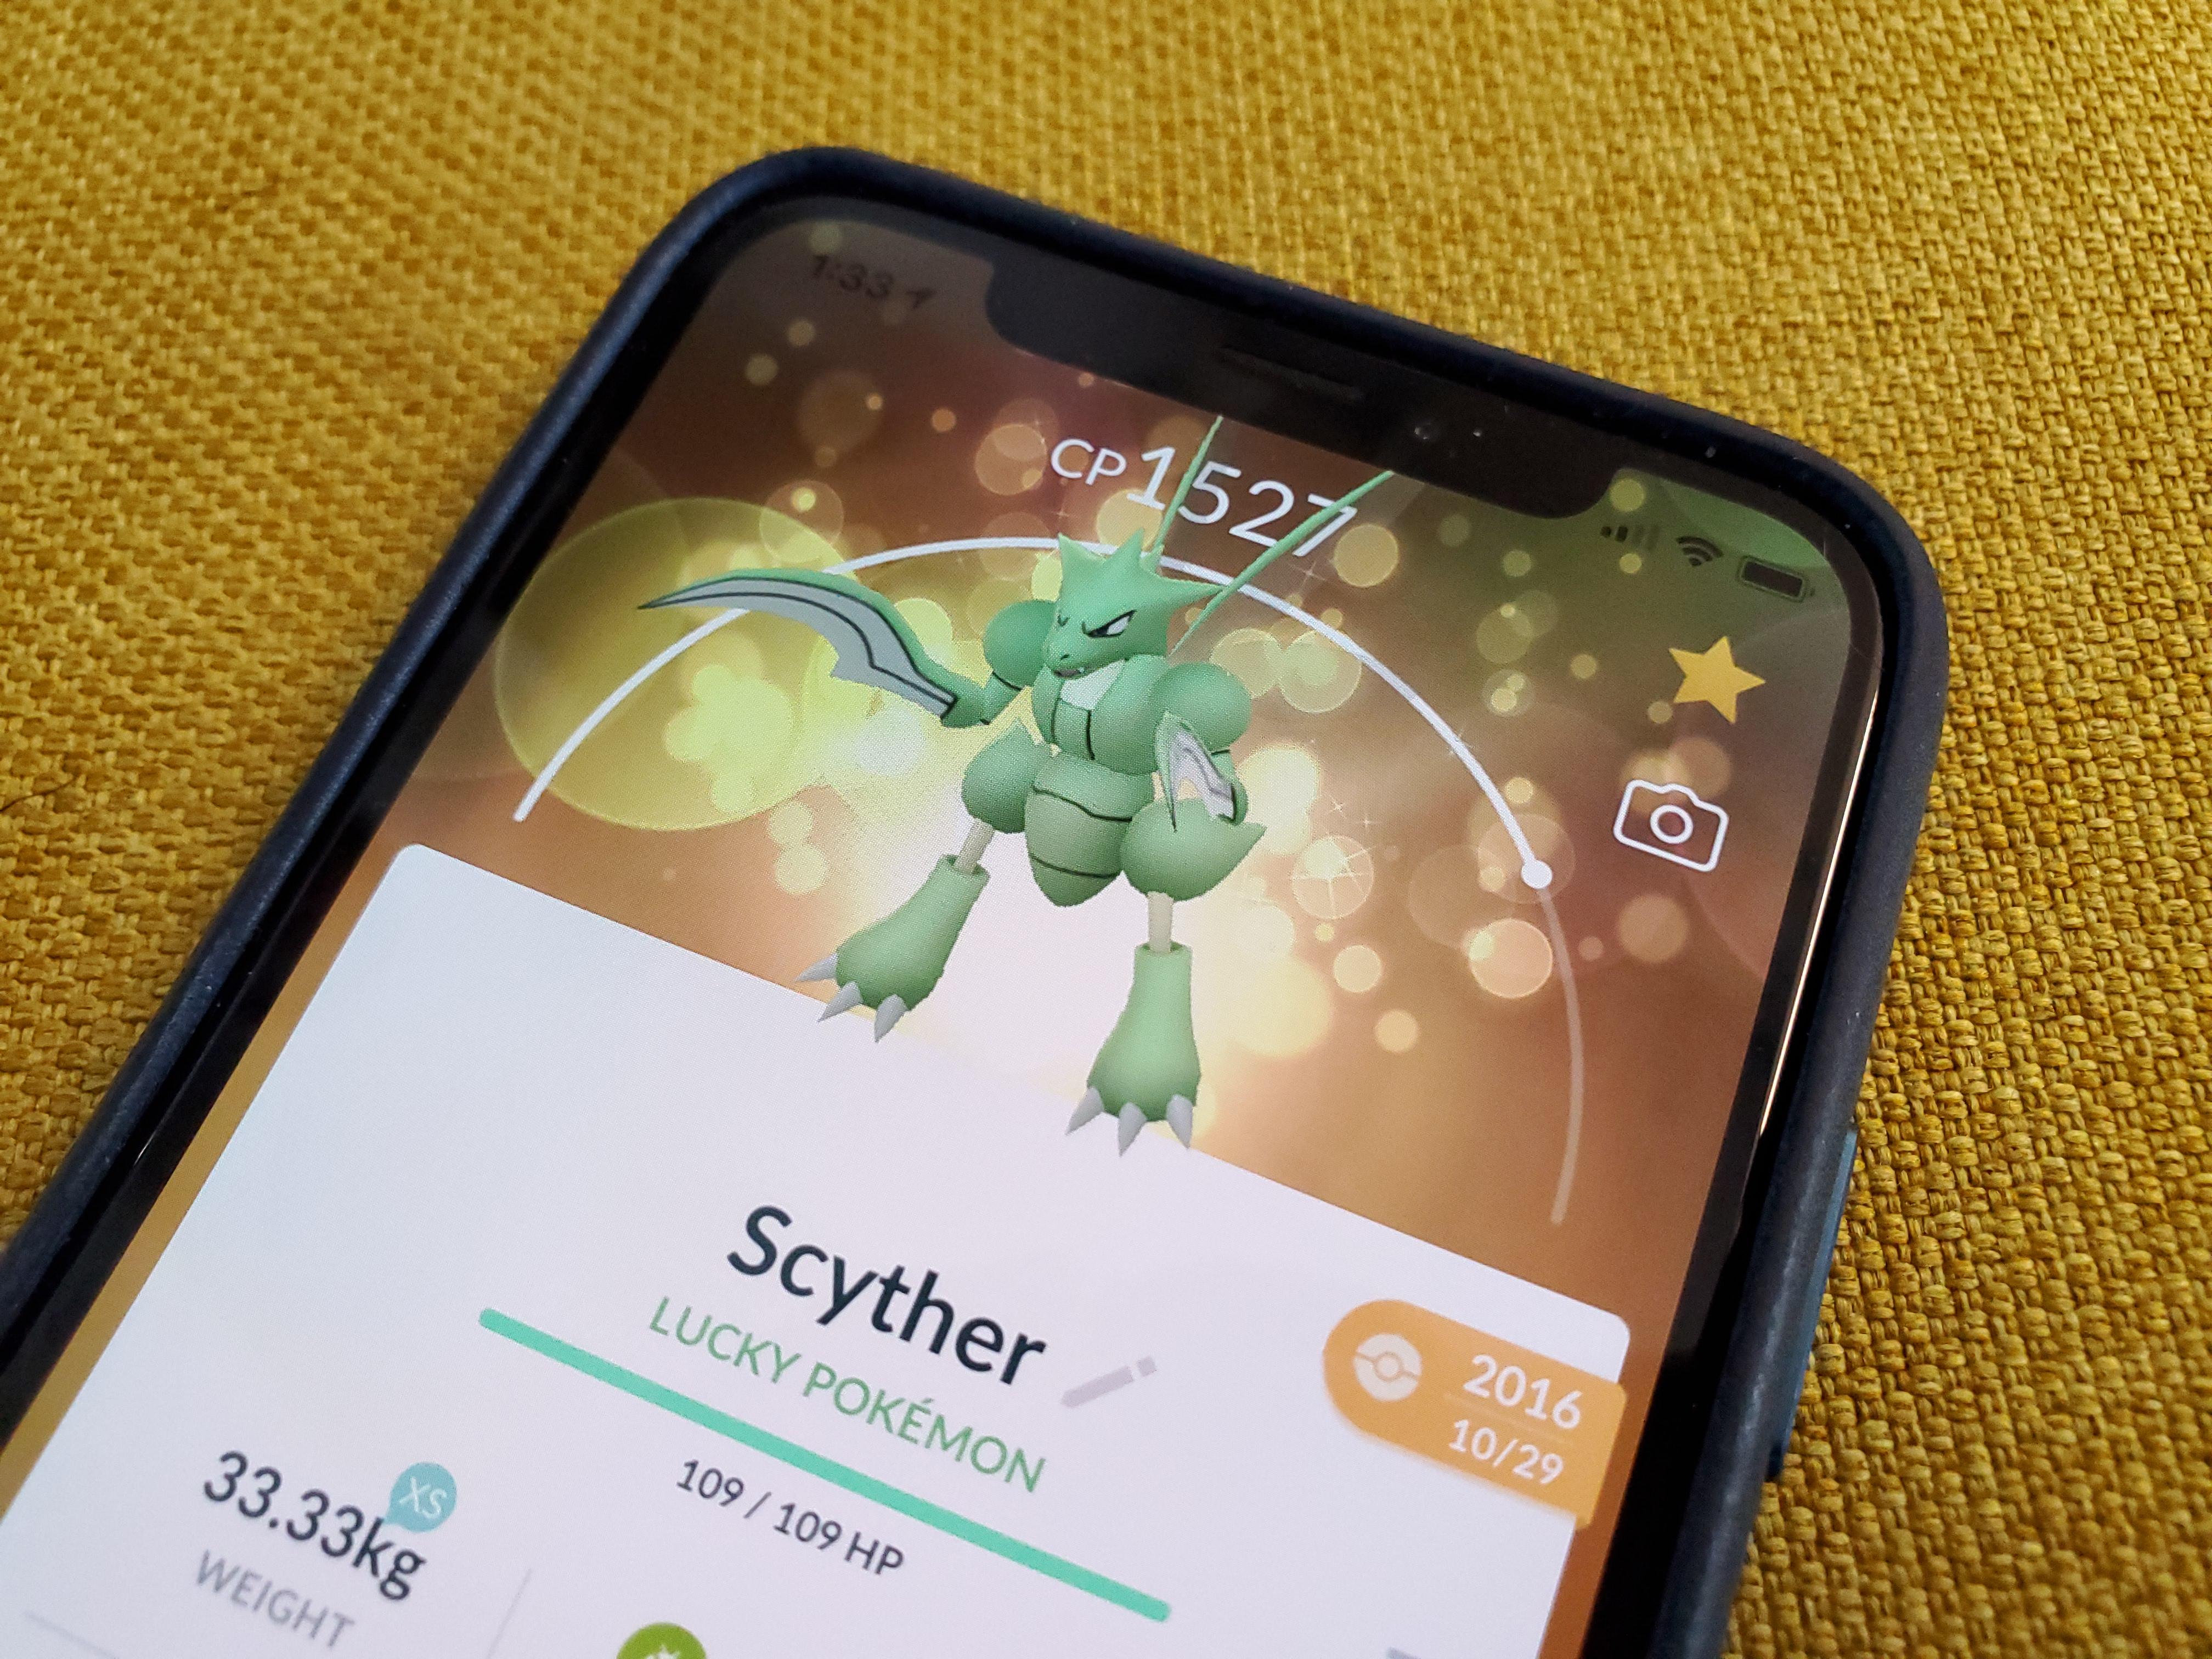 Pokémon Go Evolution Event 2019 guide: field research and rewards